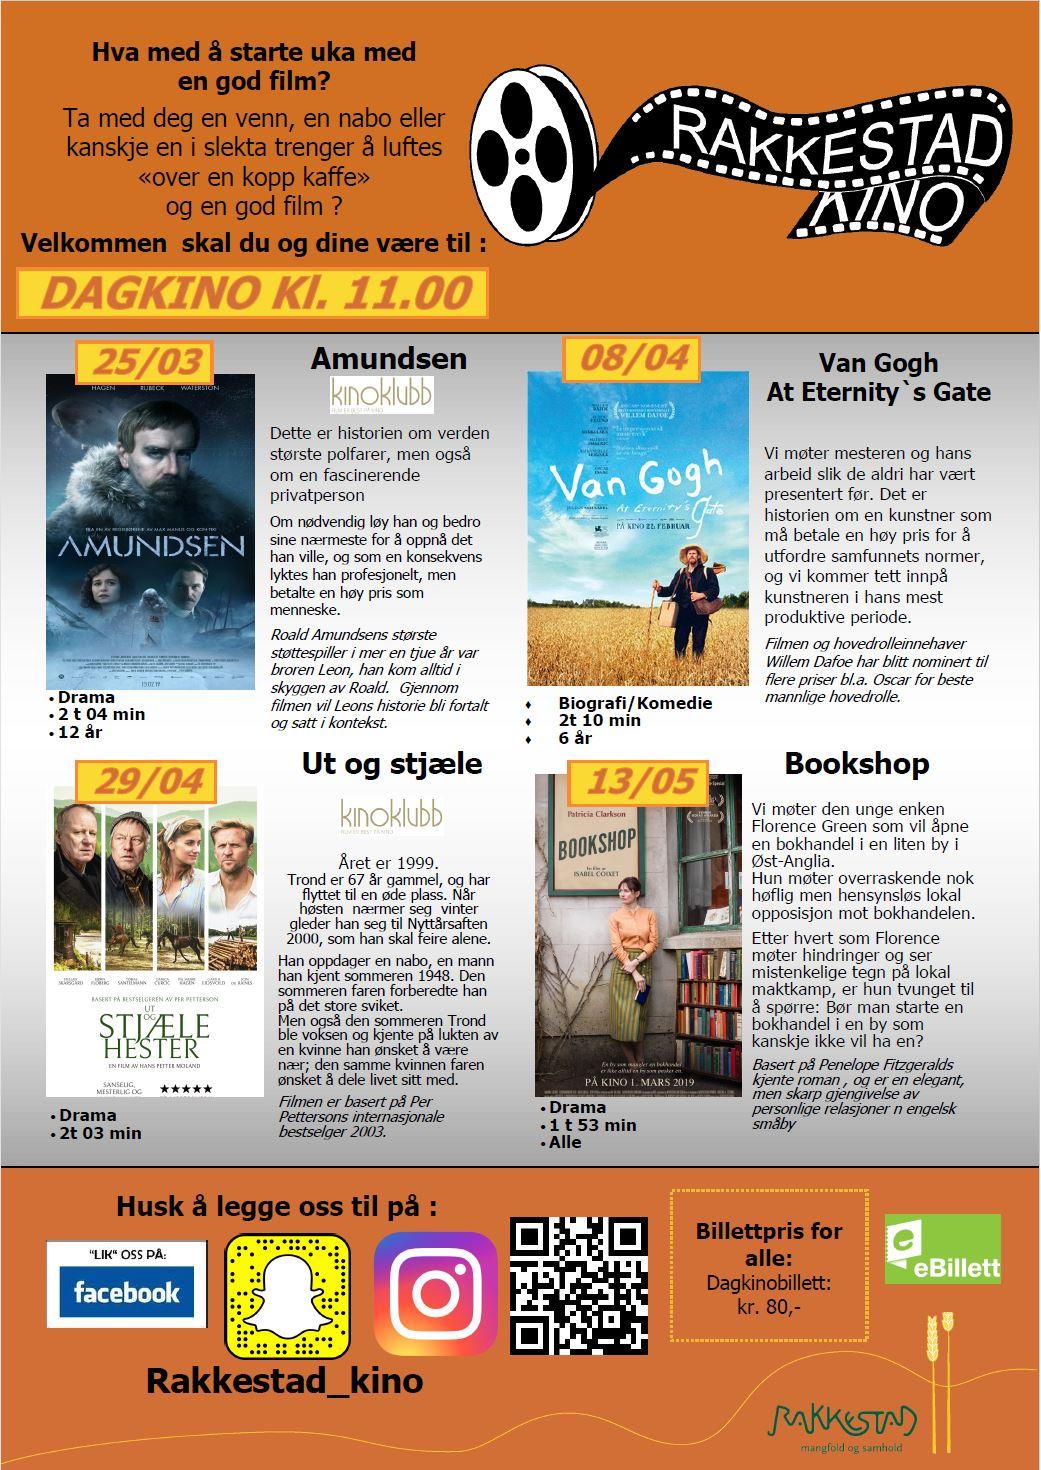 Plakat Dagkino mars - mai 2019 Rakkestad kino.jpg